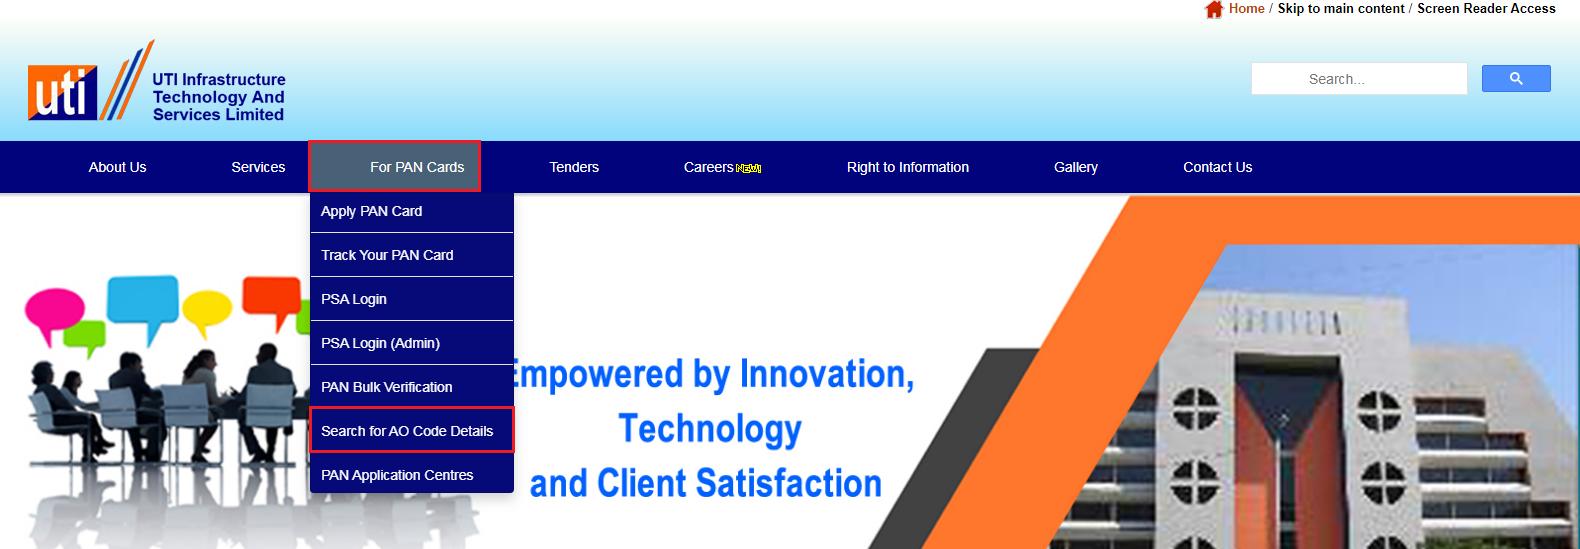 UTIITSL - Homepage Dashboard